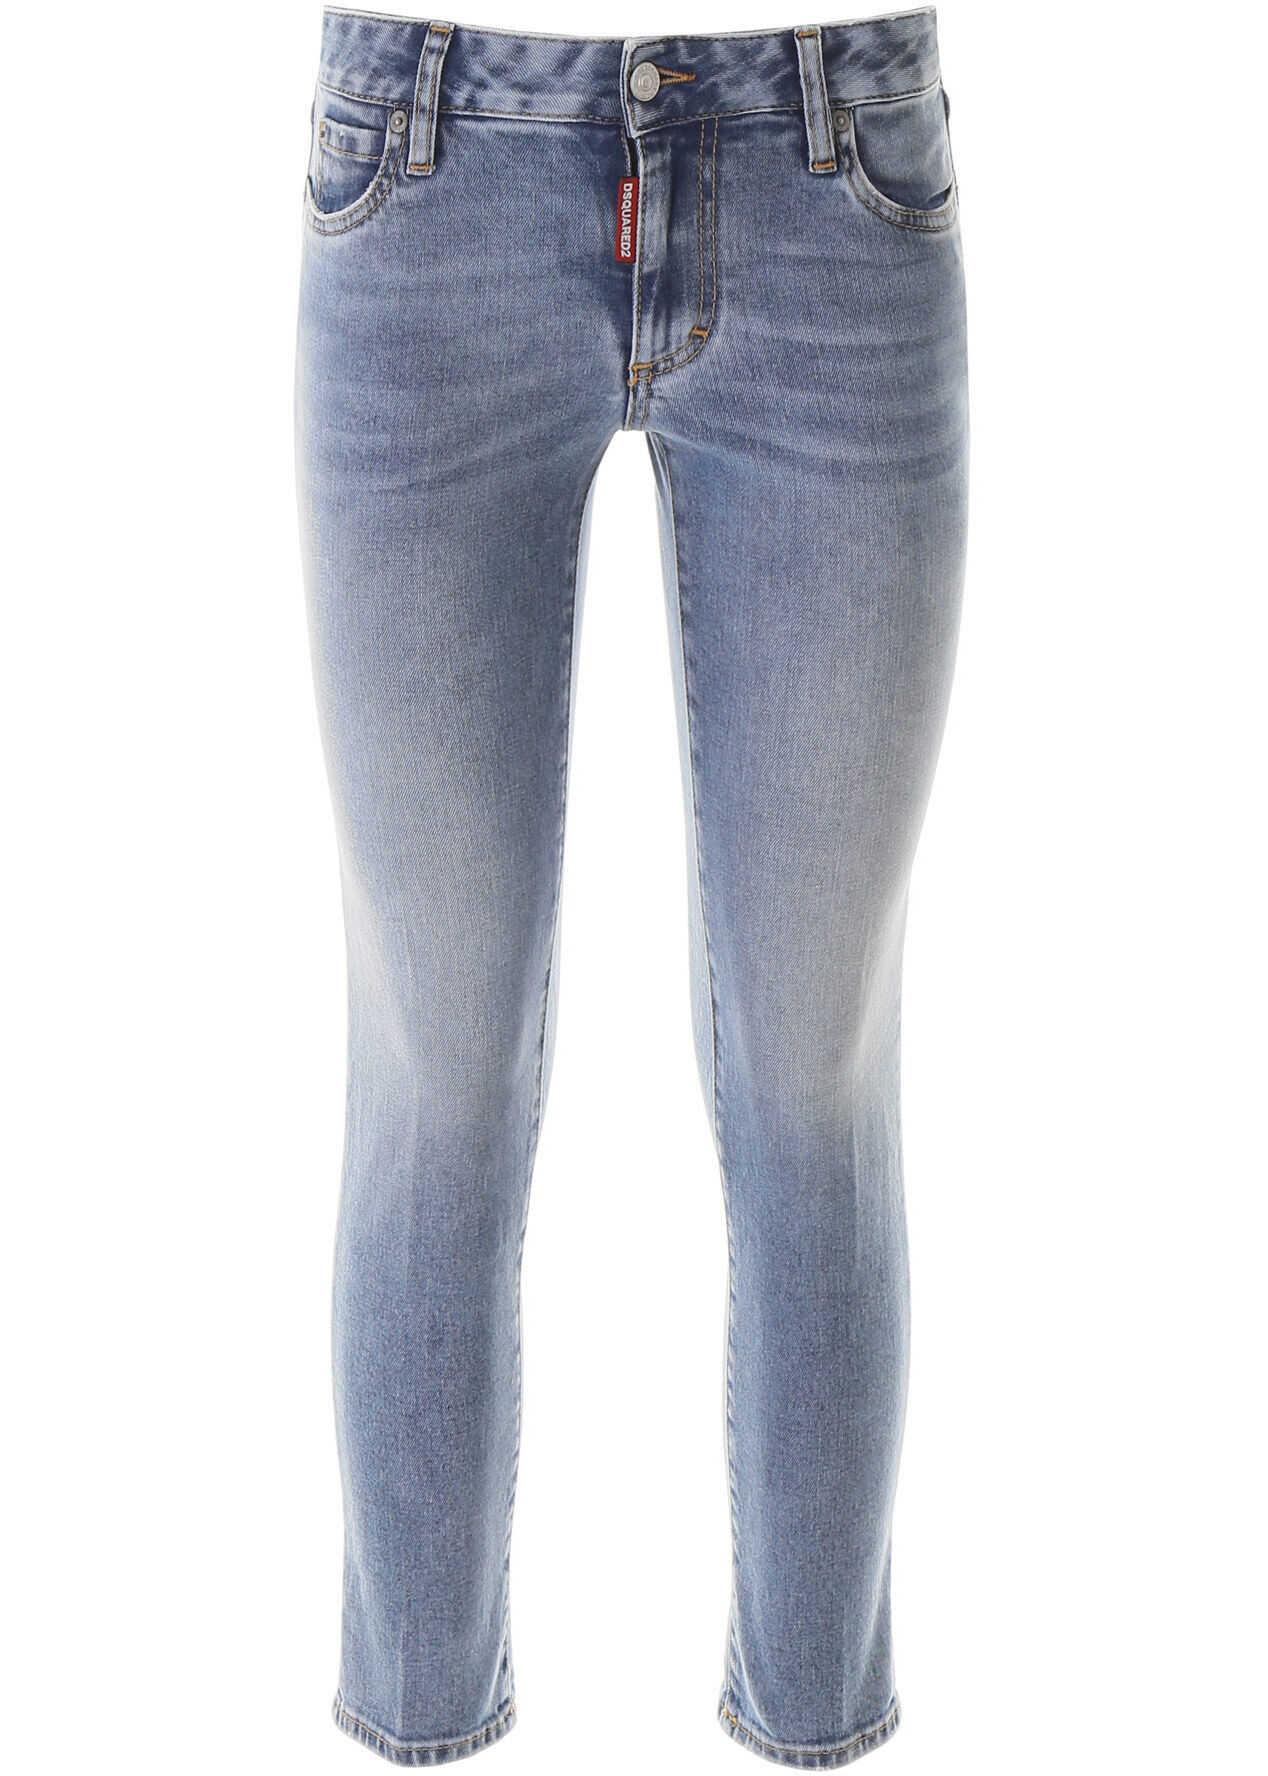 DSQUARED2 Slim Jeans BLUE